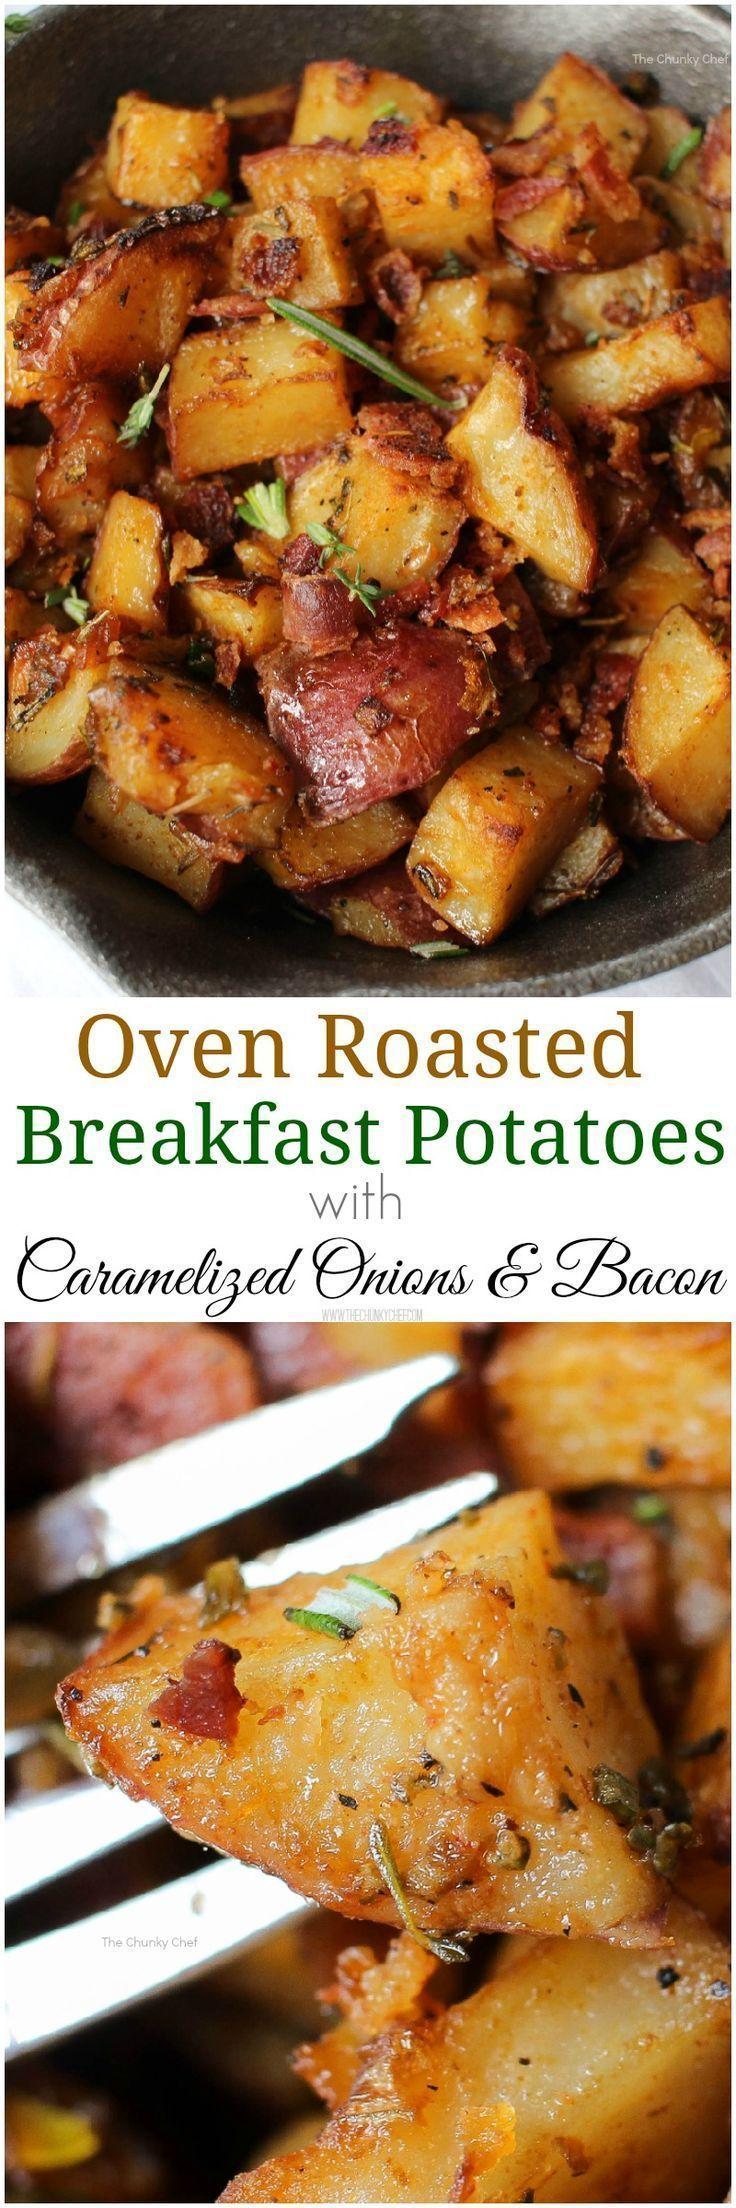 Redskin potato recipes easy